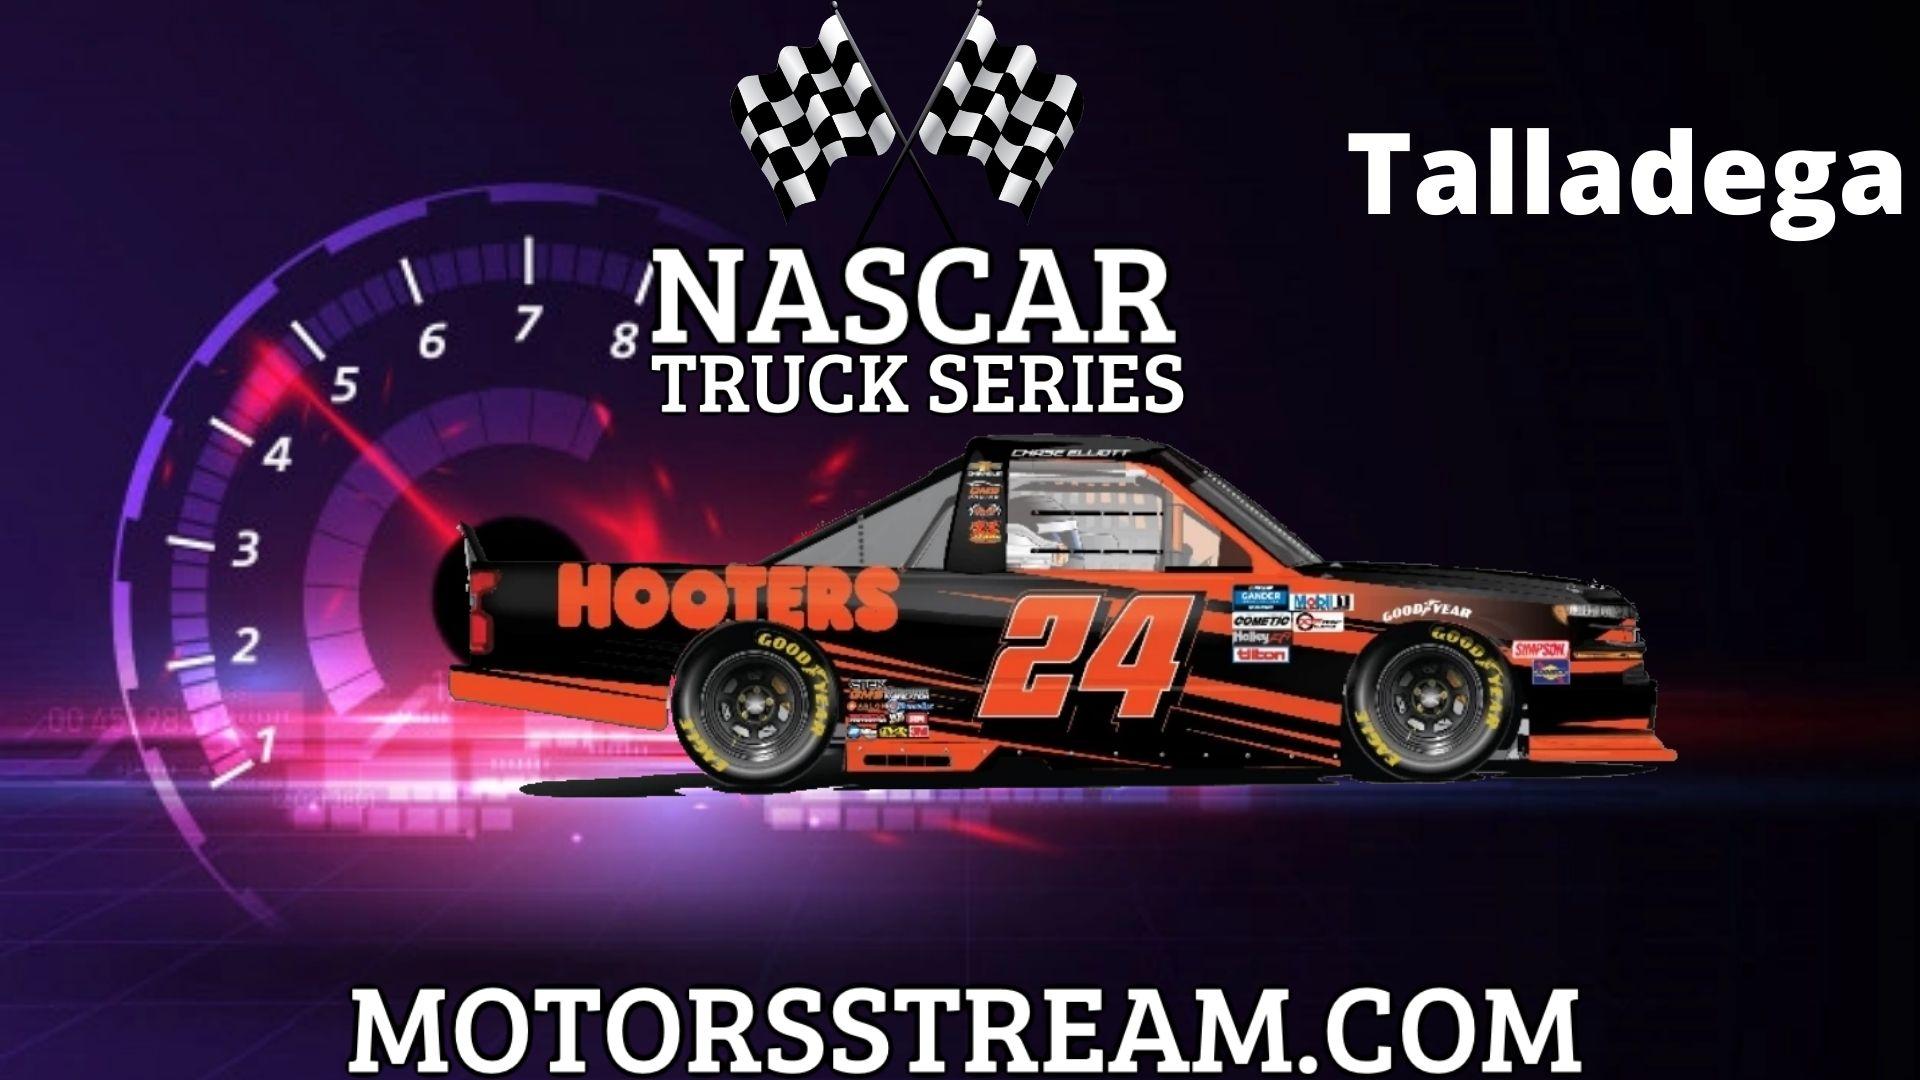 NASCAR Truck Series Race At Talladega Live Stream | Talladega 2021